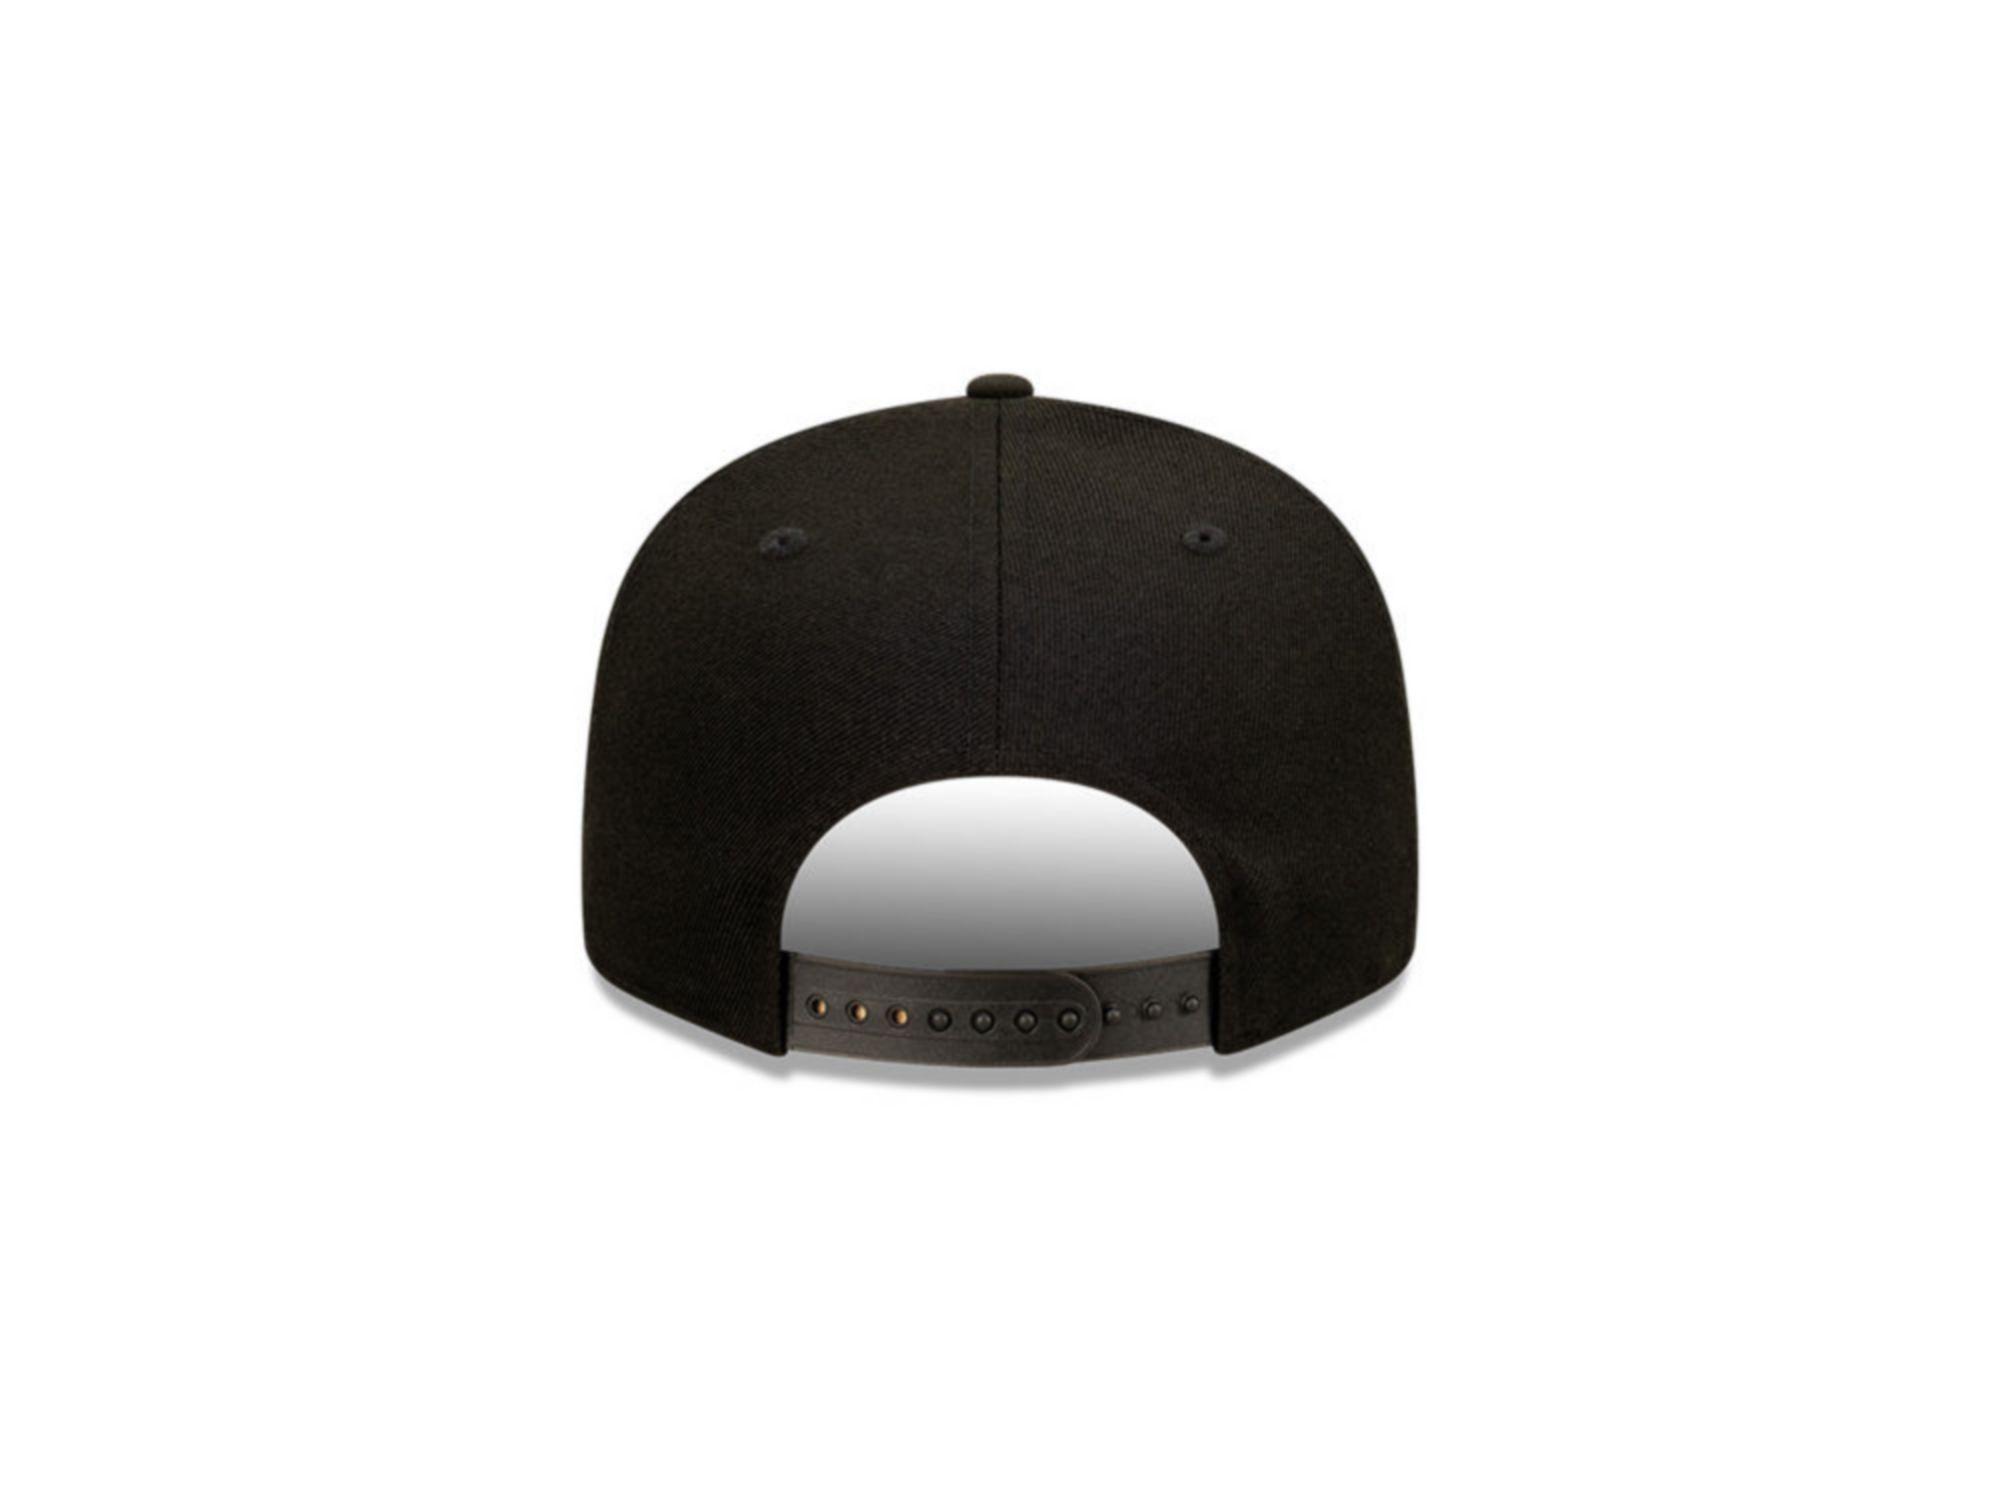 New Era Las Vegas Raiders Basic 9FIFTY Snapback Cap & Reviews - NFL - Sports Fan Shop - Macy's